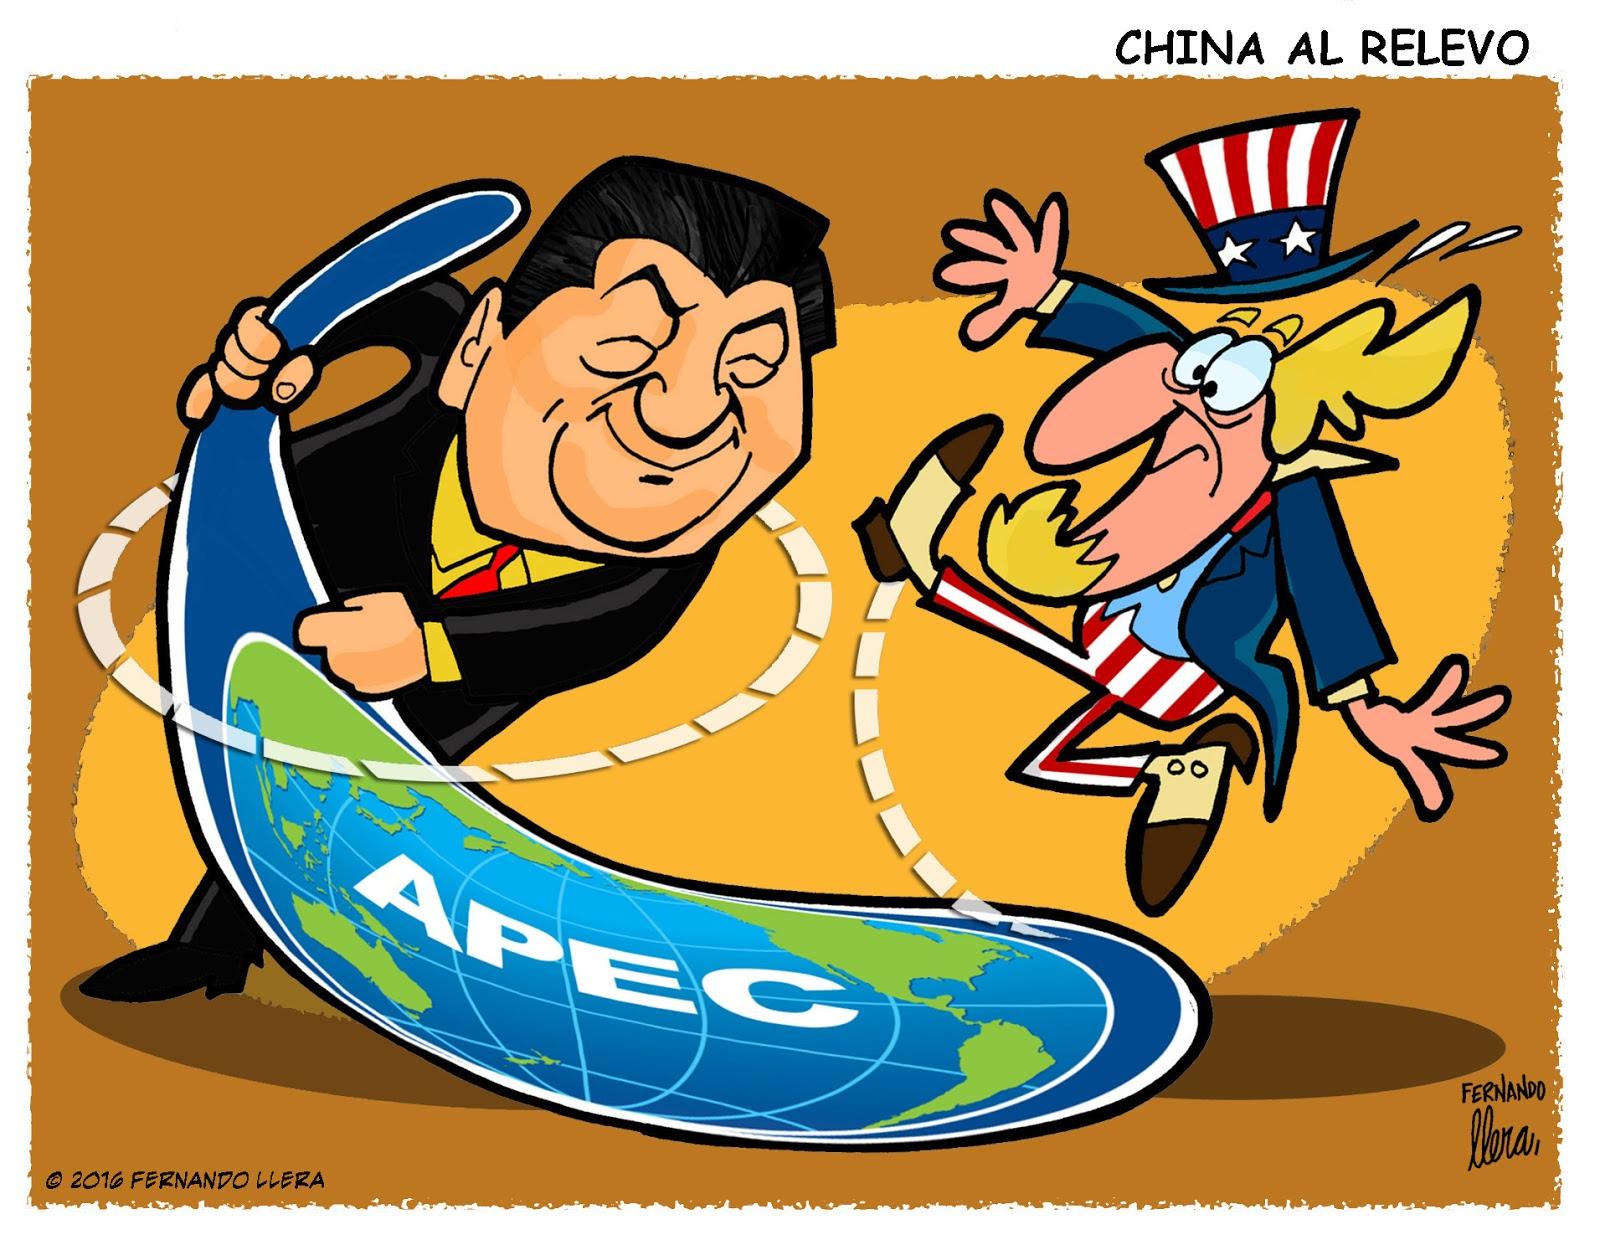 Apec summit clipart png free stock Fernando Llera Blog Cartoons: APEC Summit: Xi Jinping pledges ... png free stock